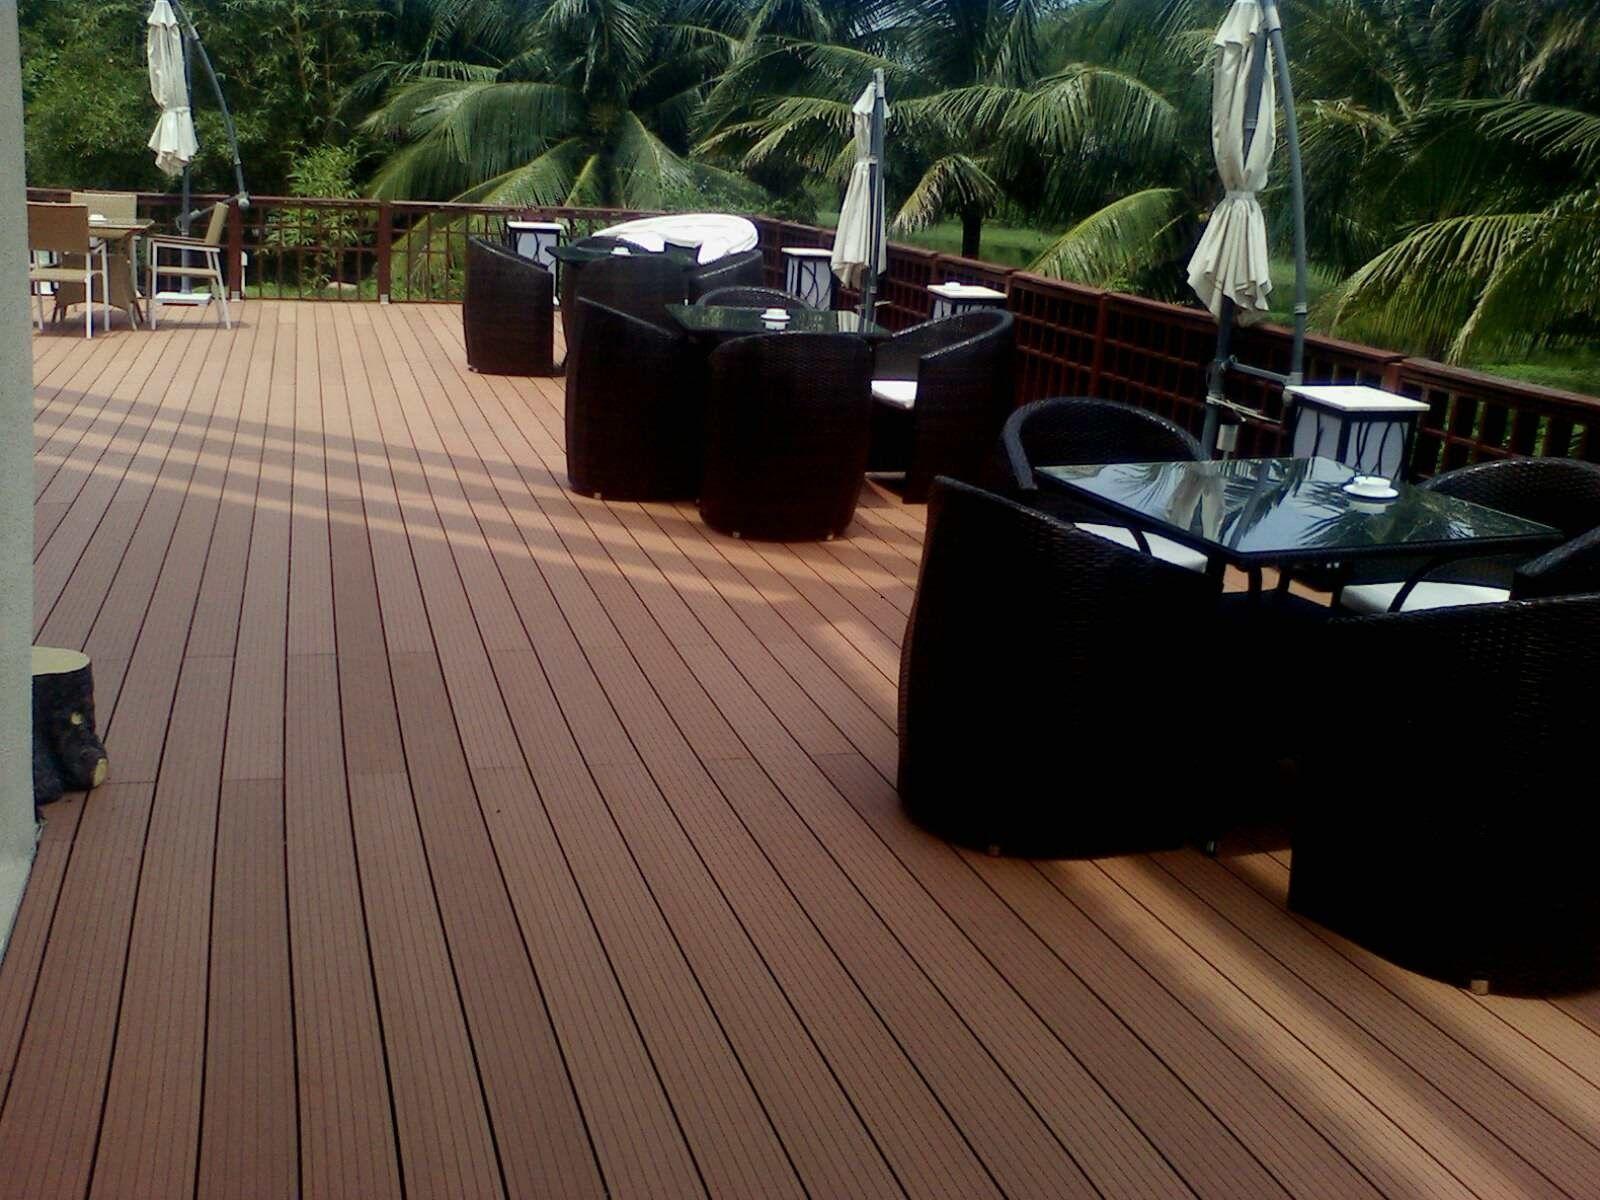 Delightful Eco Friendly Wood Plastic Composite Flooring、 Buy Plastic Laminate Flooring